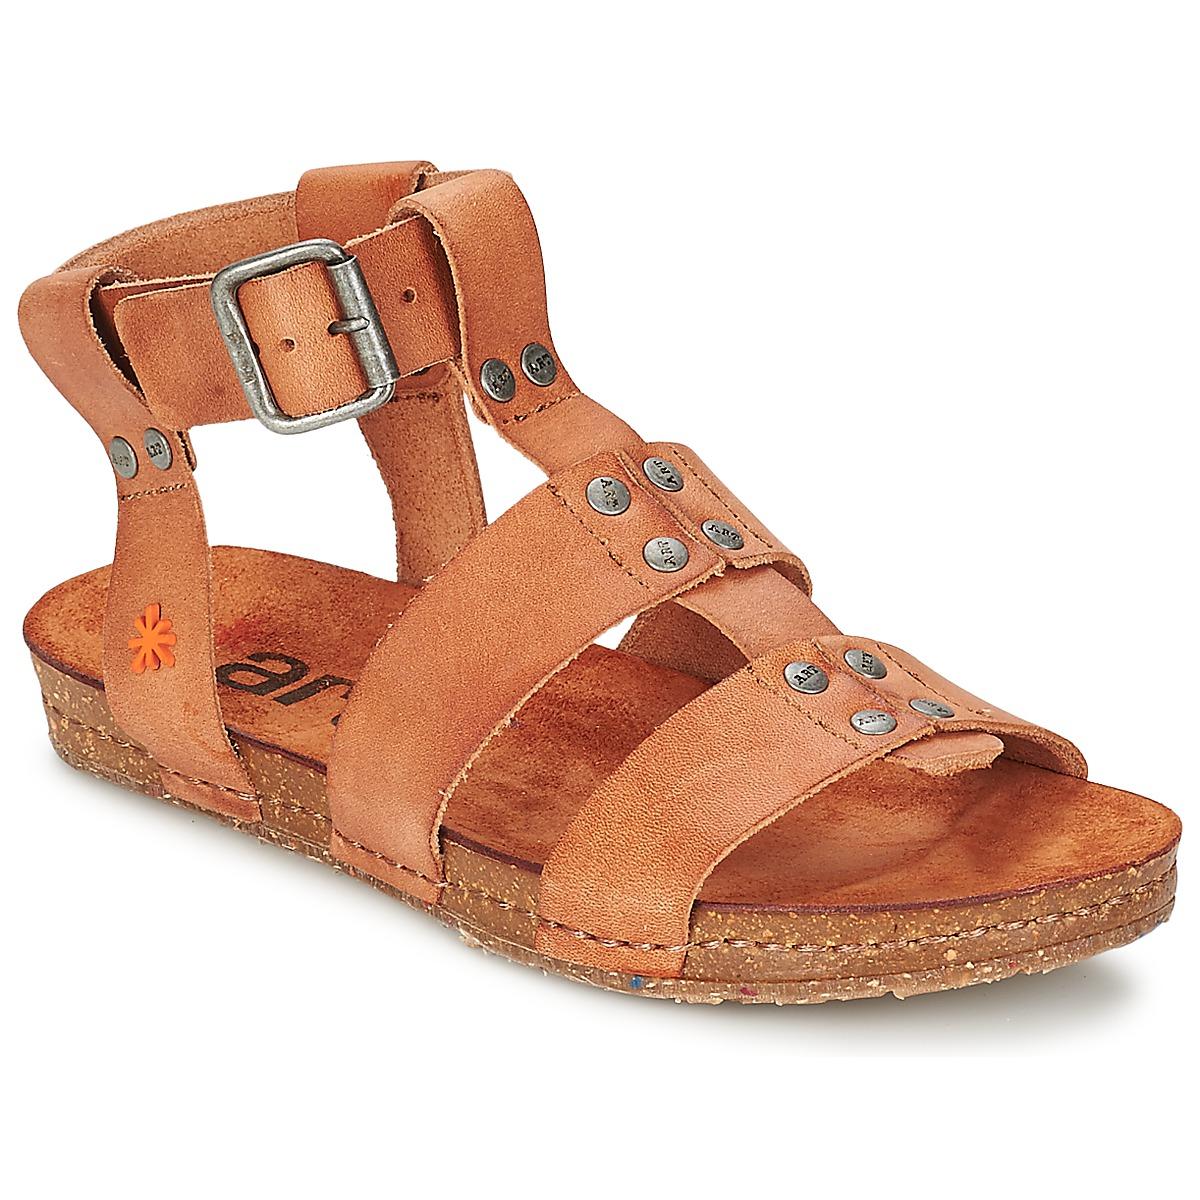 Sandals Art CRETA SPARA CAMEL